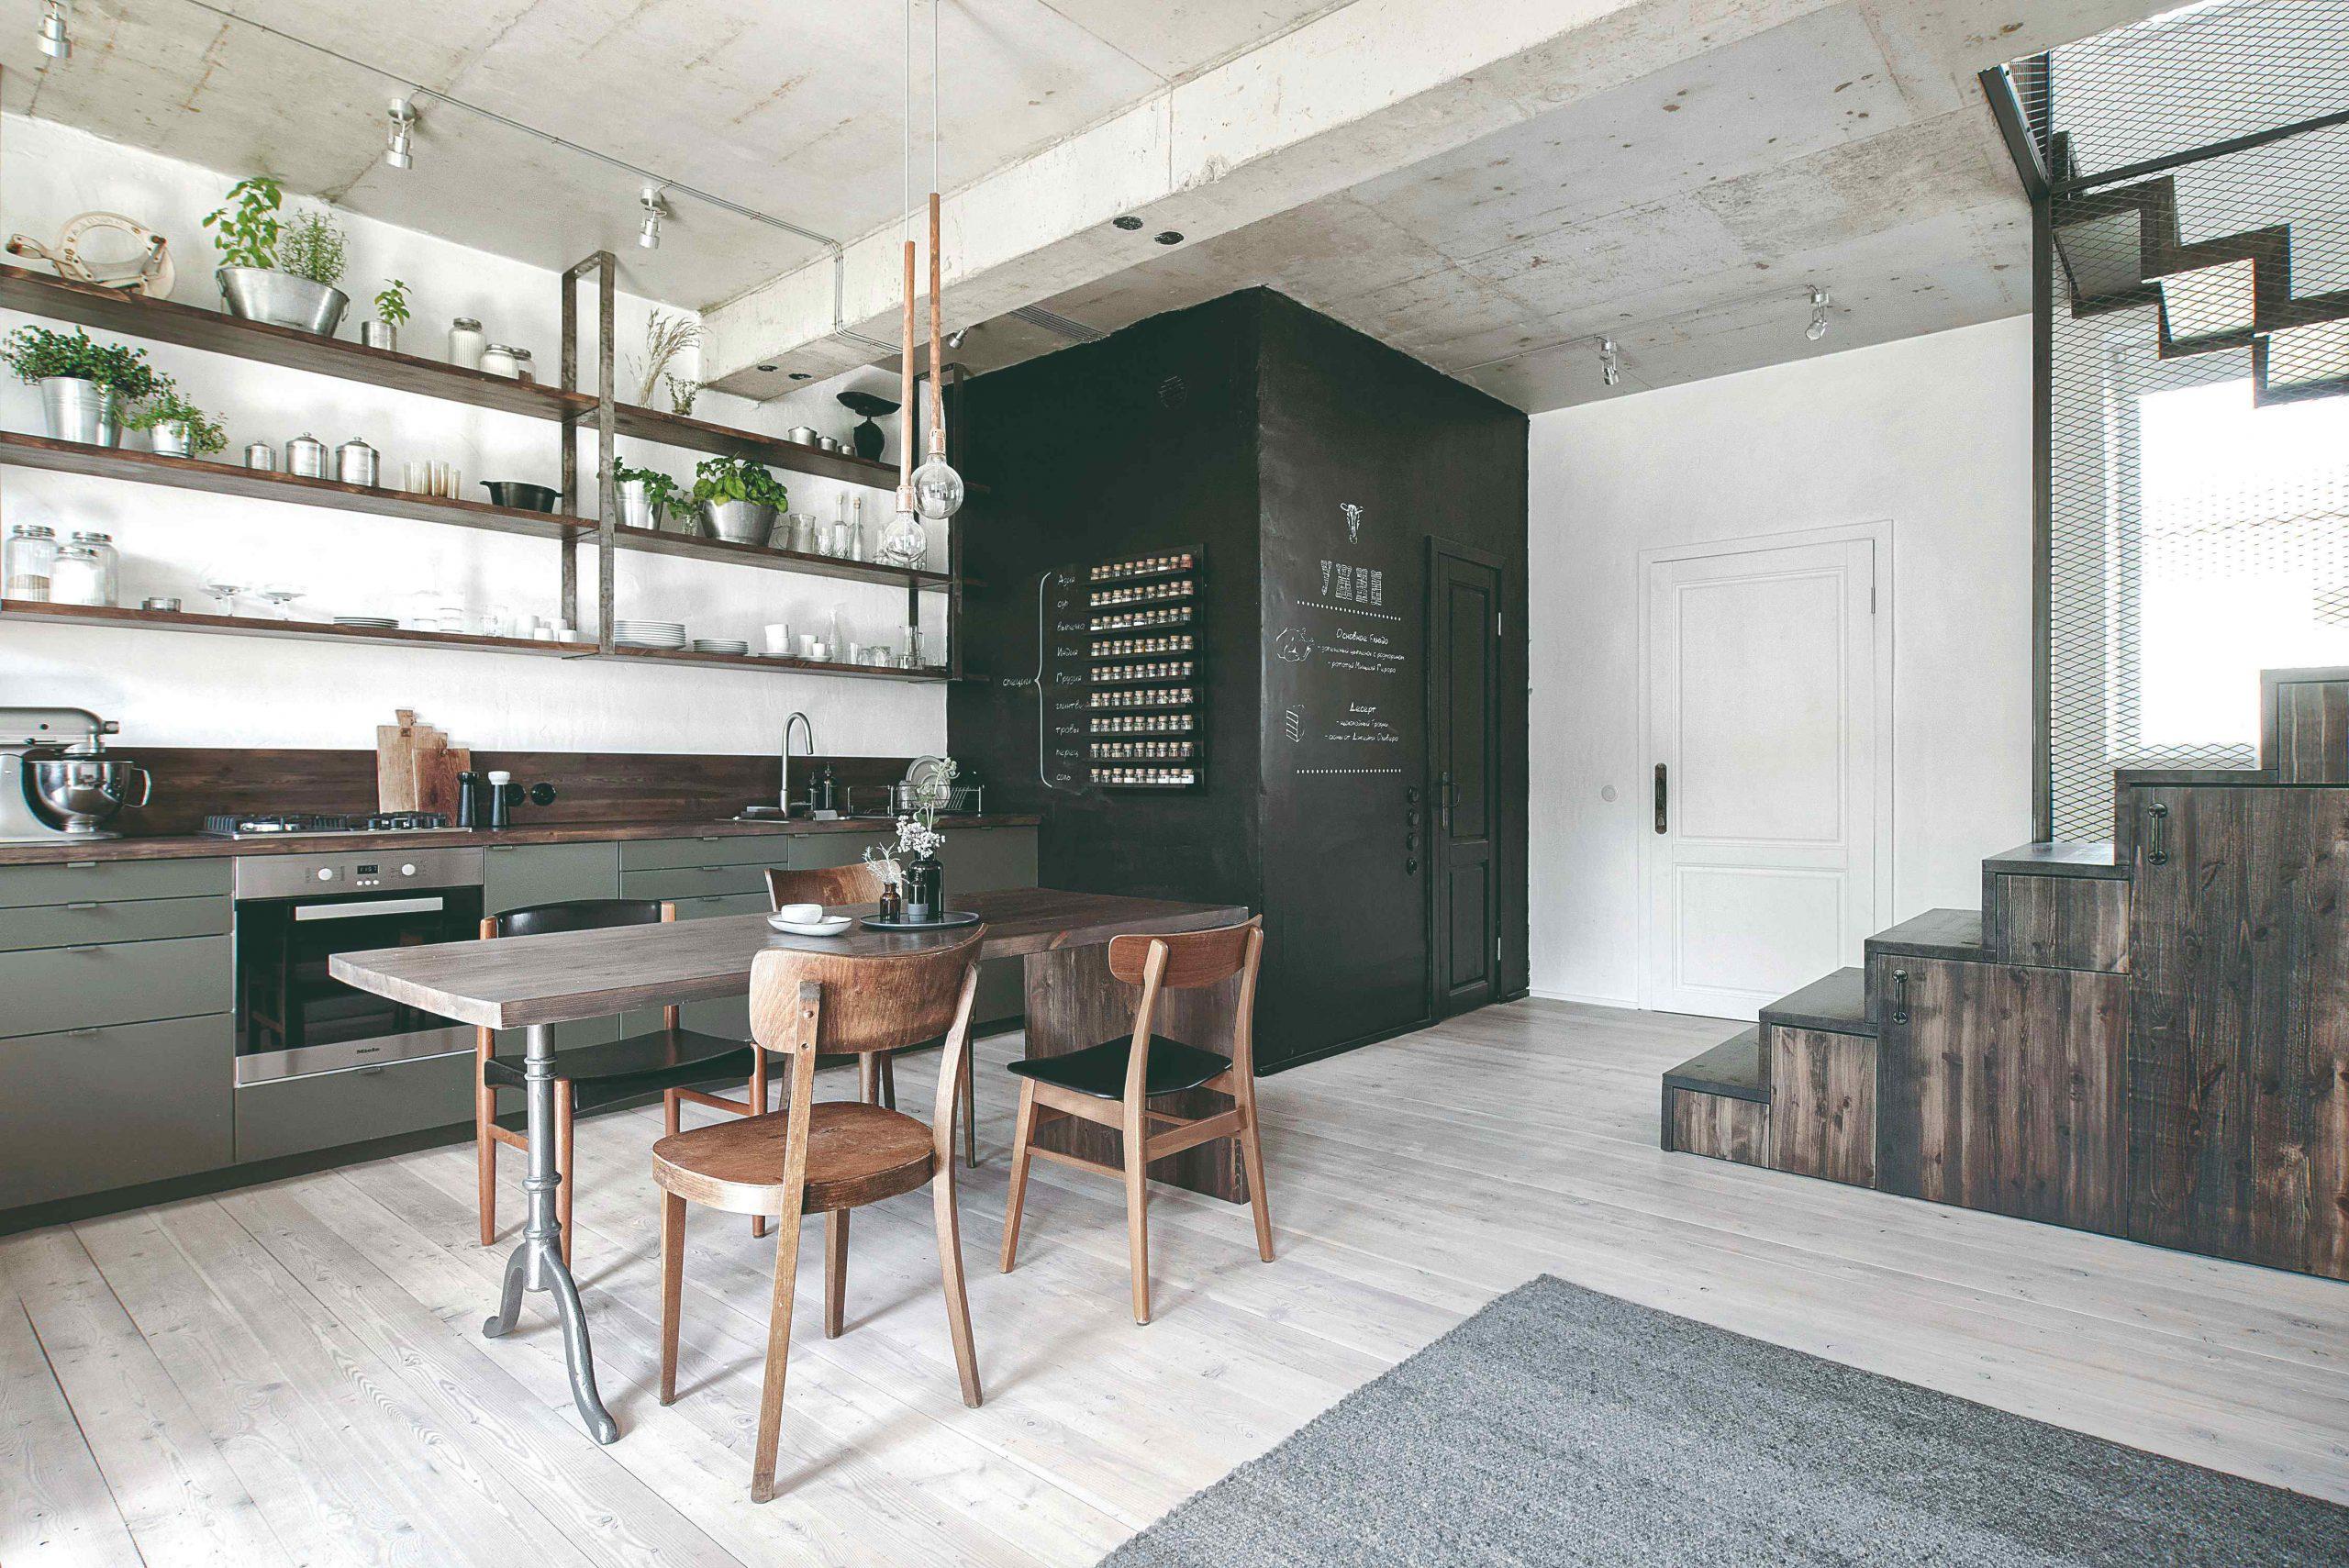 Industrálna kuchyňa s vintage stoličkami